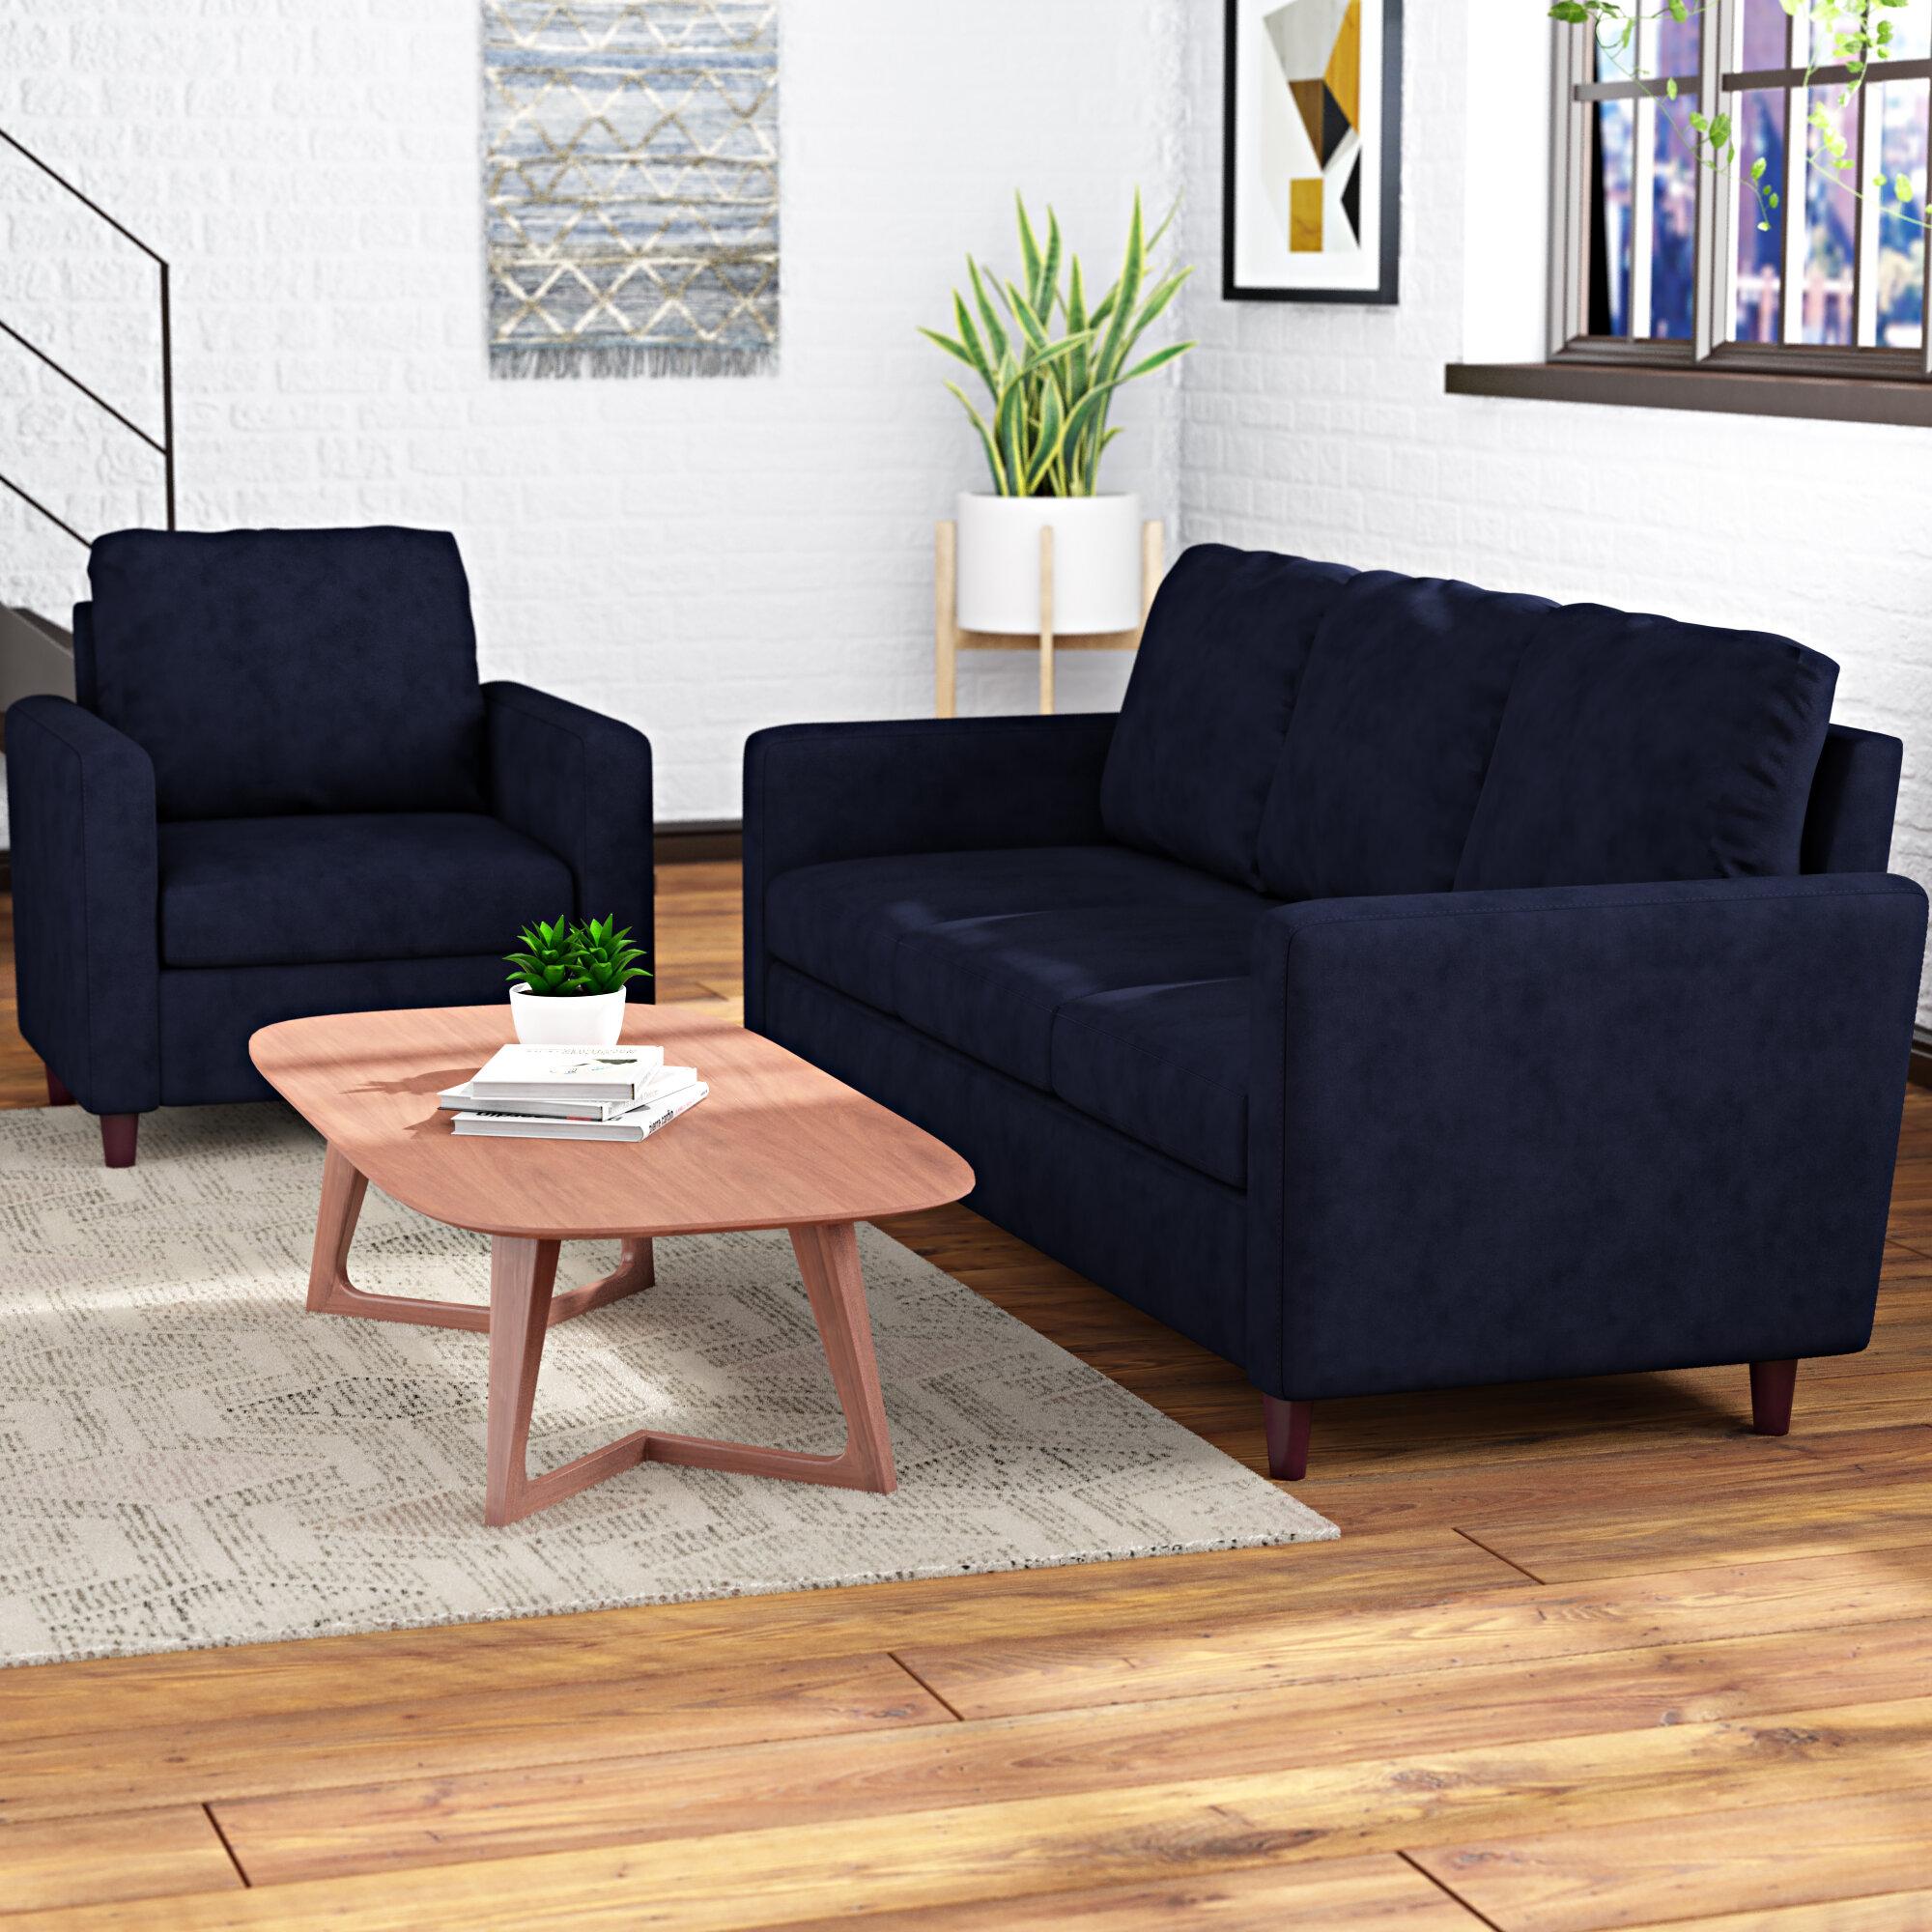 Wrought studio anglin raisin fabric modern 2 piece wood frame living room set wayfair